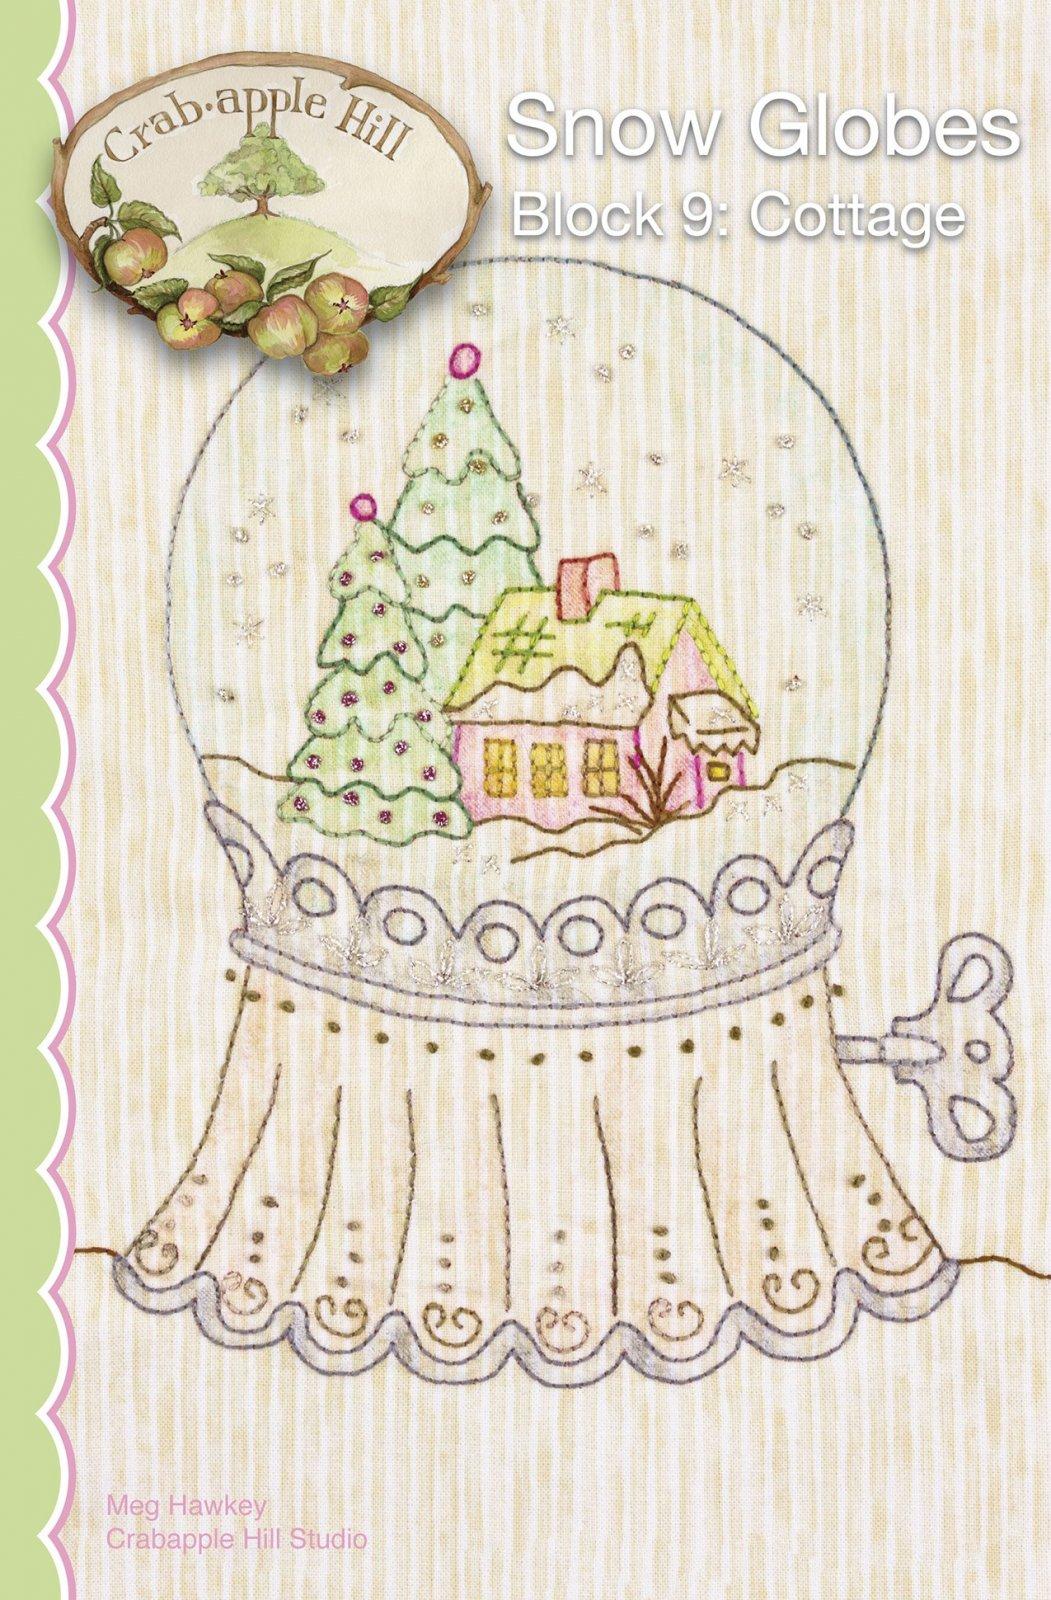 Snow Globes - 9 - Cottage